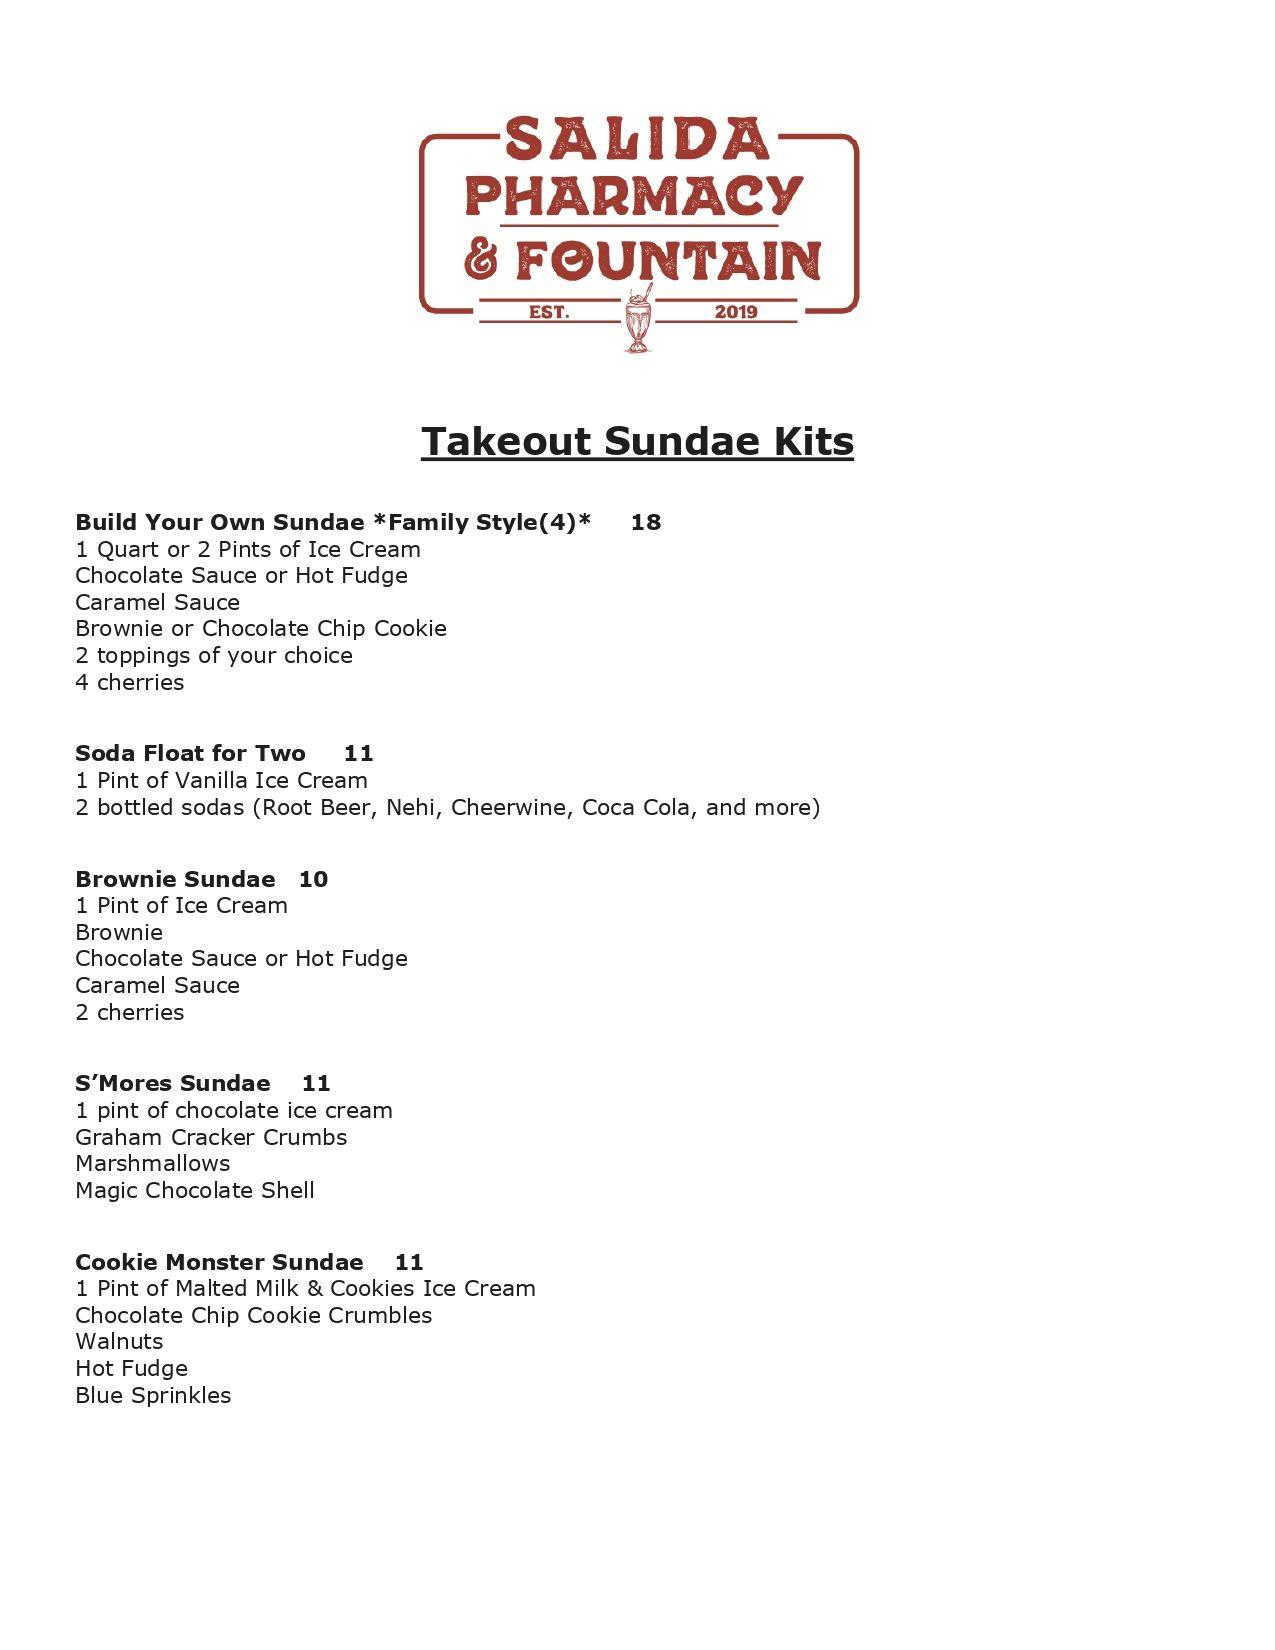 Takeout Sundae Kits_page-0001.jpg